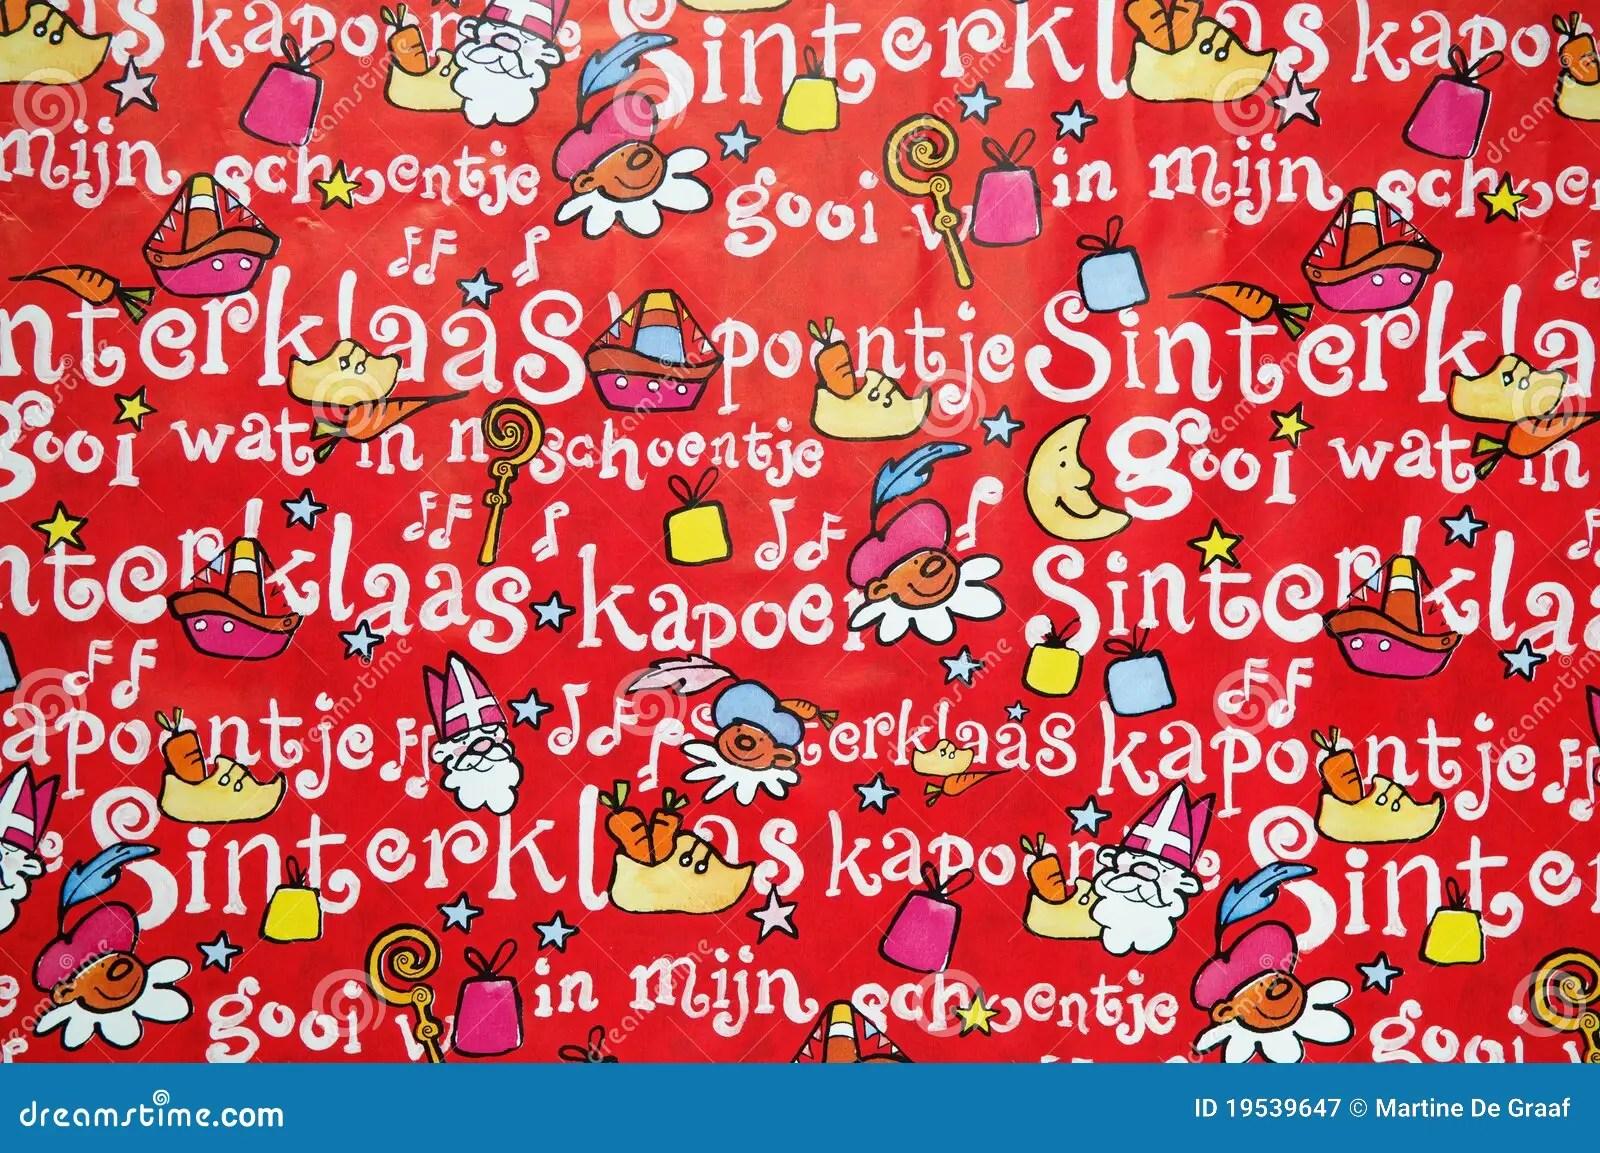 Cute Red Color Wallpaper Sinterklaas Background Stock Image Illustration Of